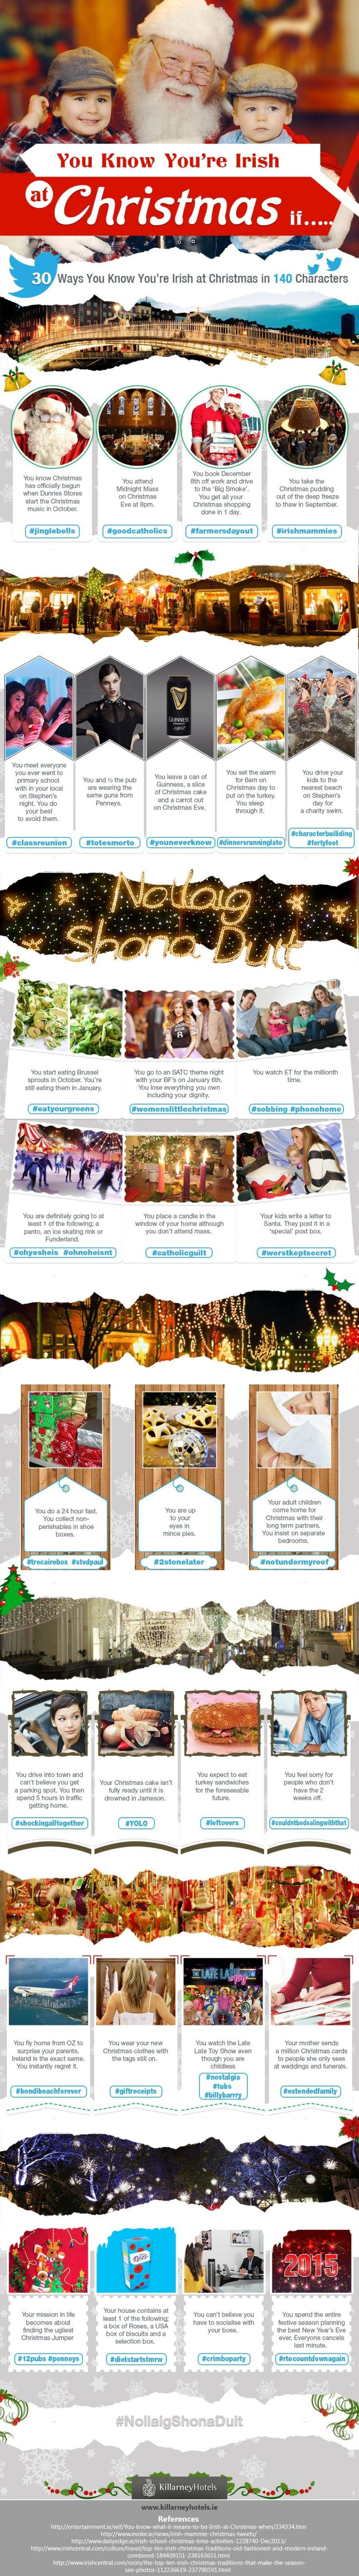 Killarney Hotels IG Christmas Ireland Final